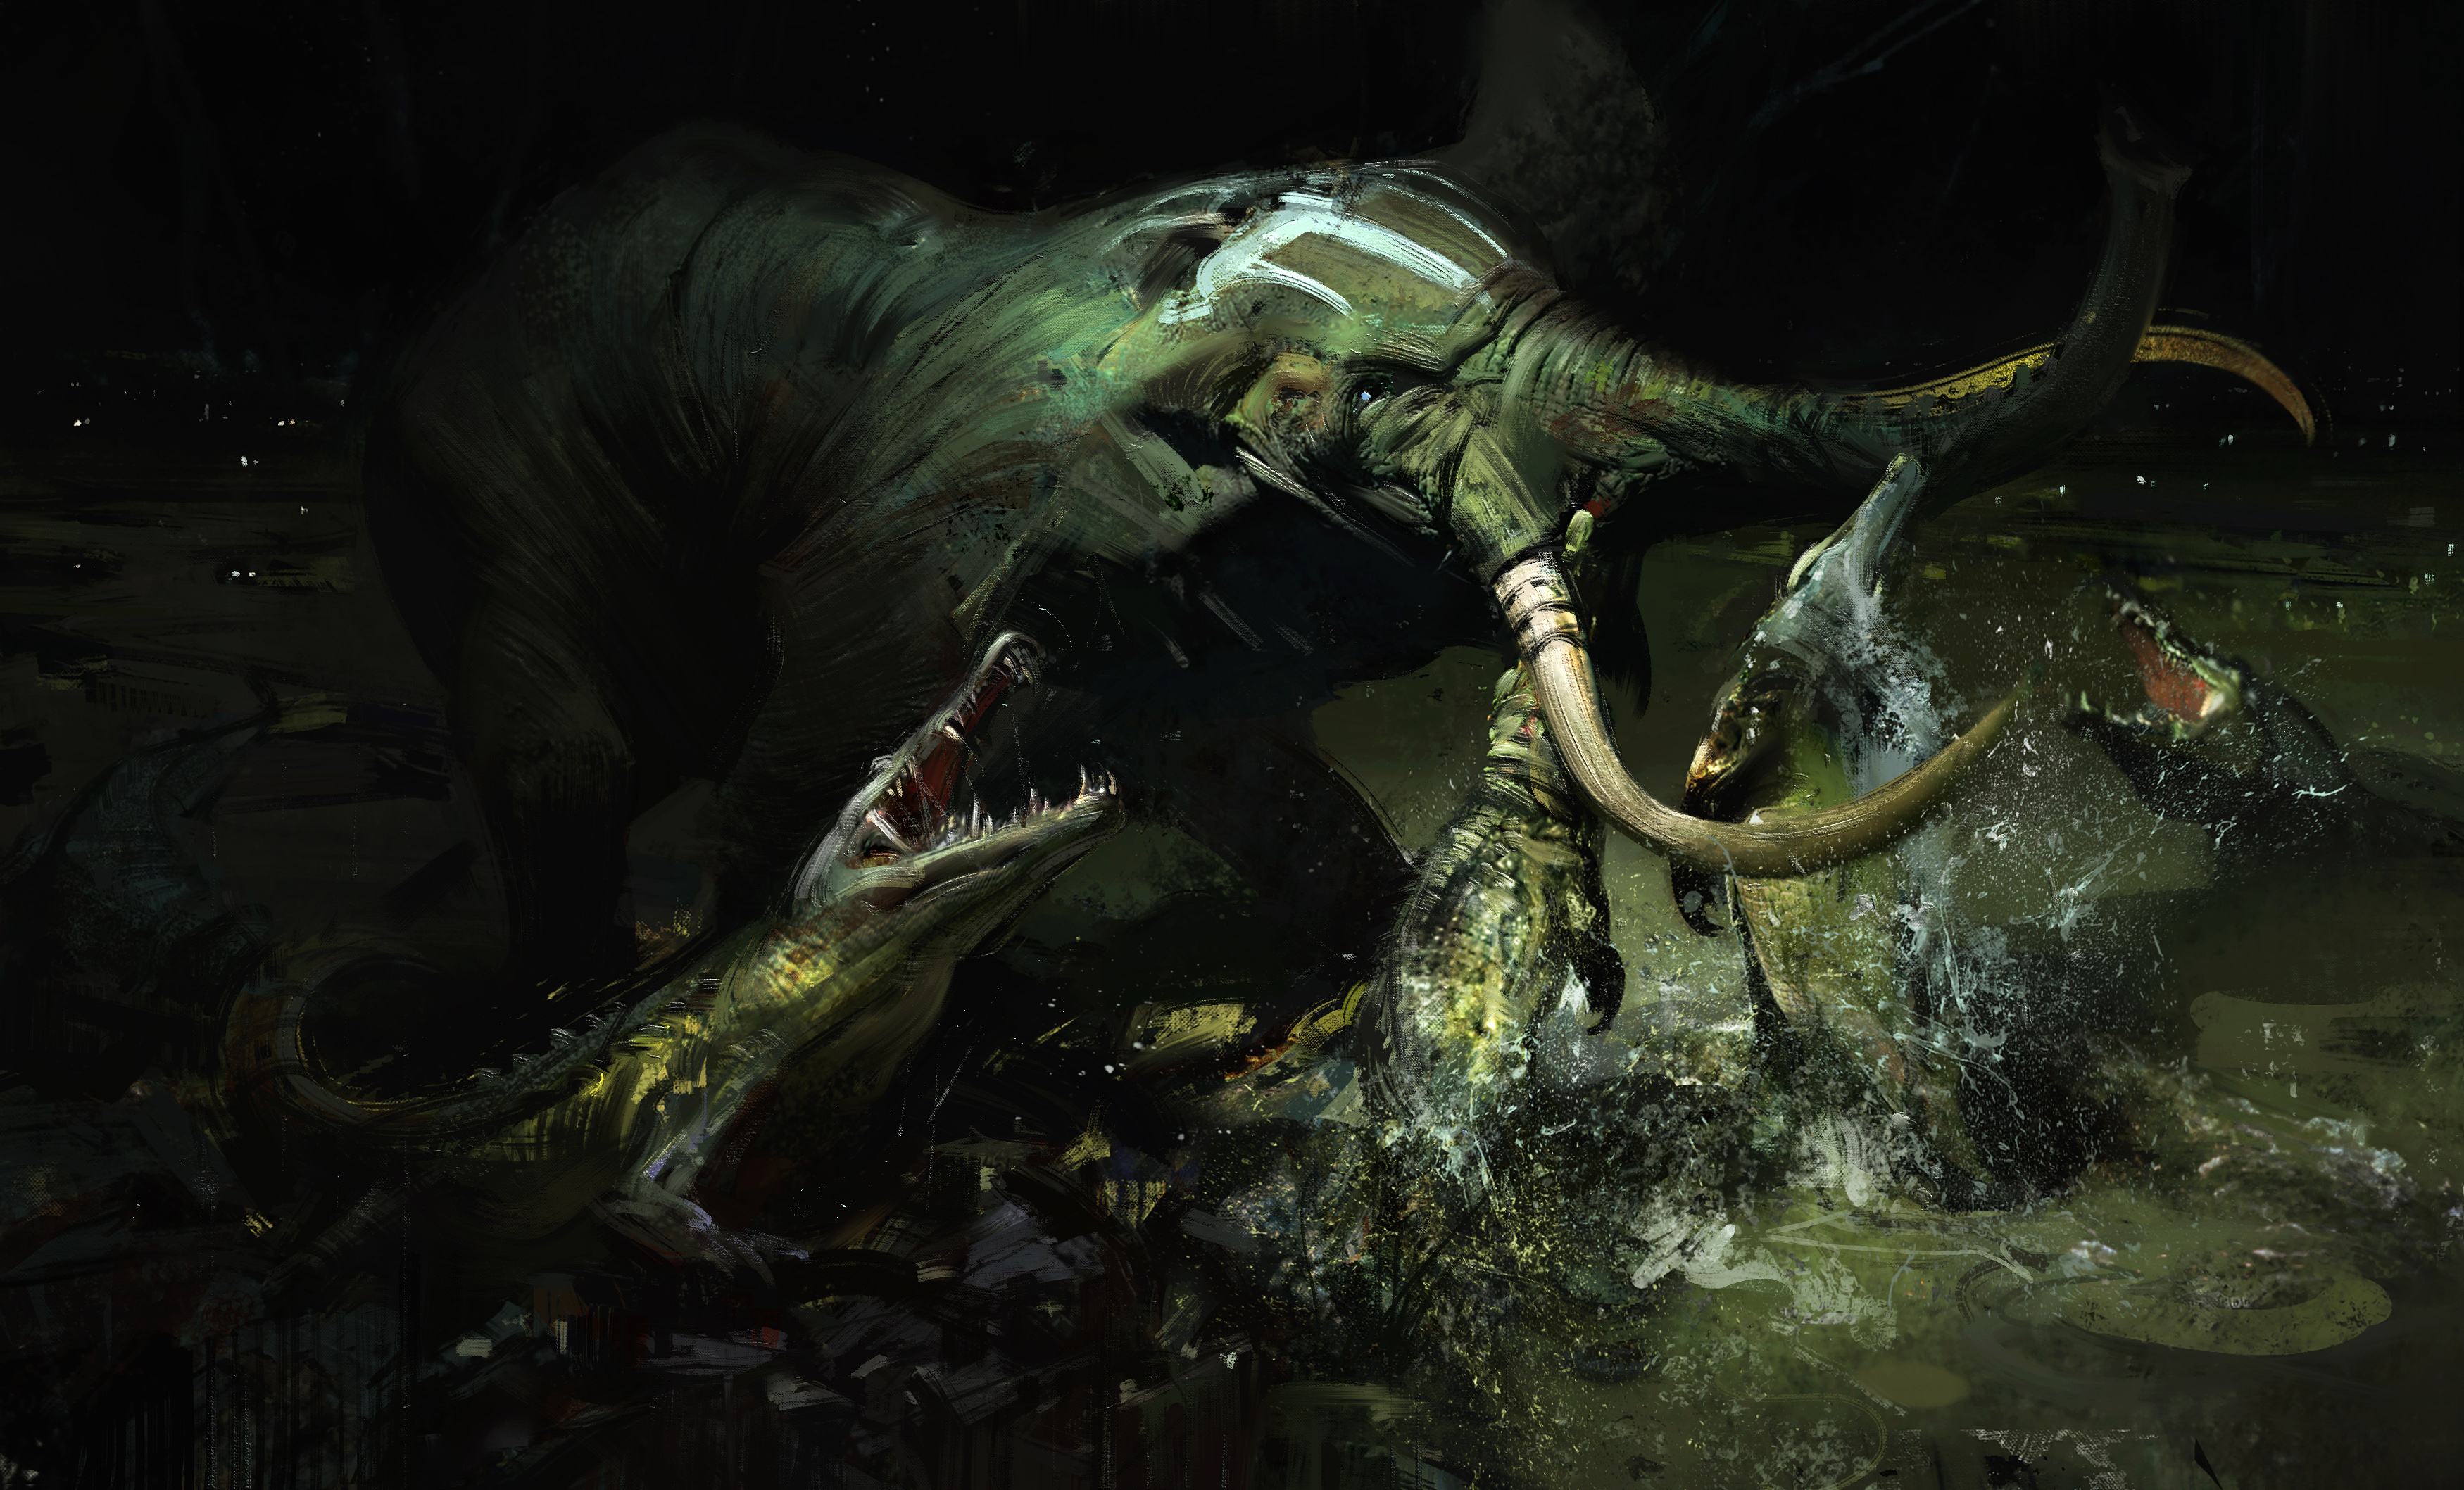 Images elephant Crocodiles Fight animal Painting Art 3500x2117